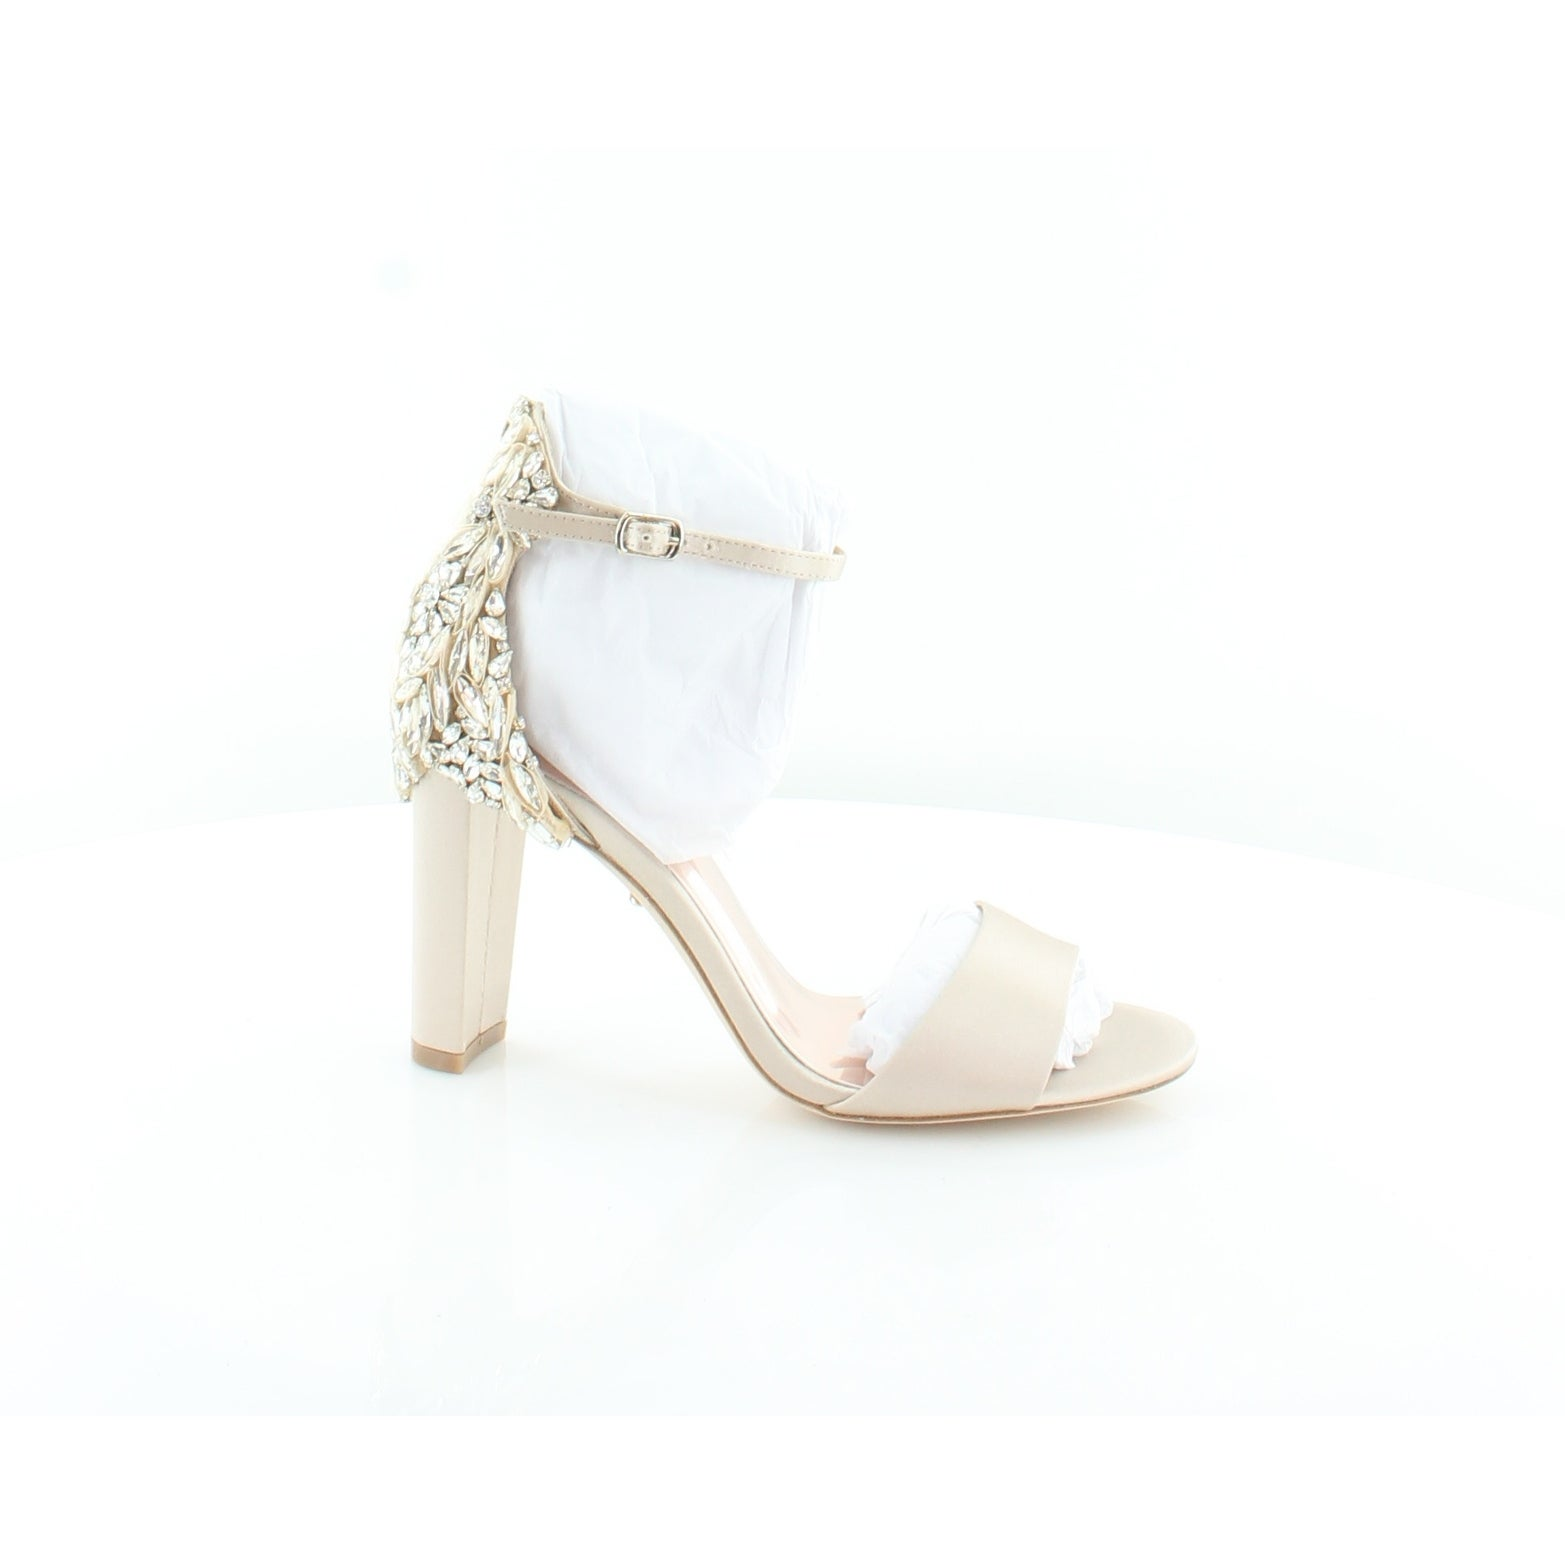 16186b3f743 Shop Badgley Mischka Seina Women s Sandals Nude - Ships To Canada -  Overstock - 25637171